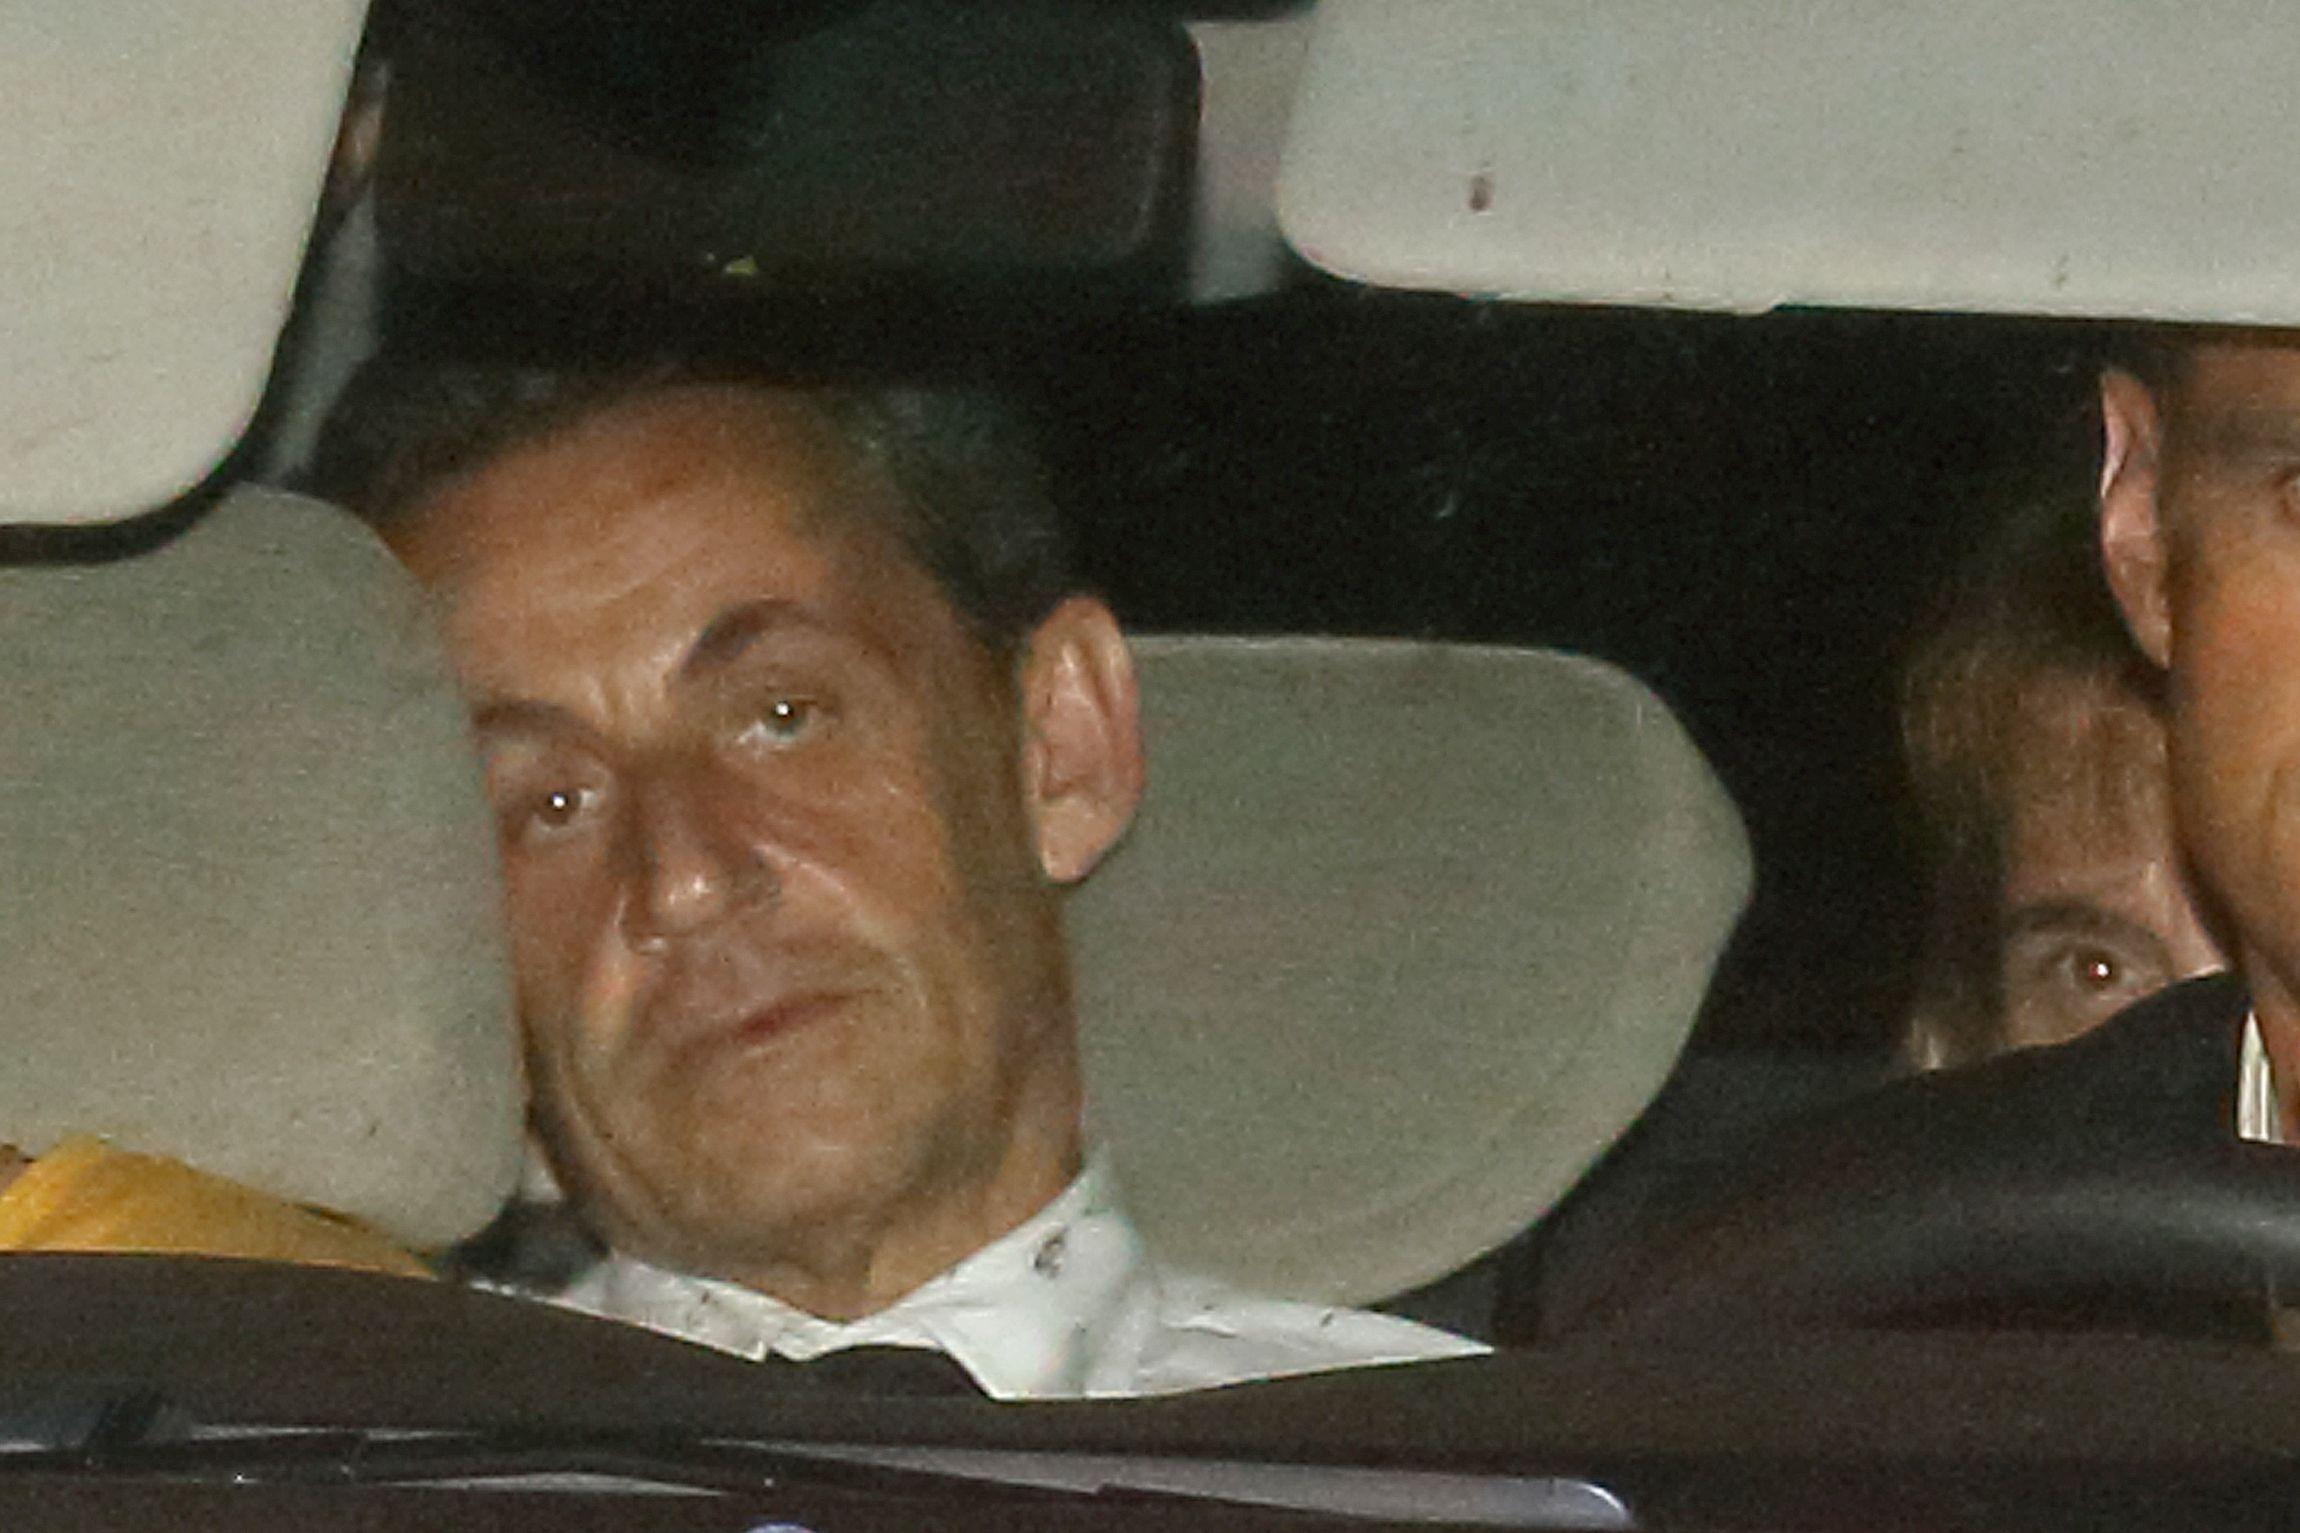 Sarkozy arrives with police